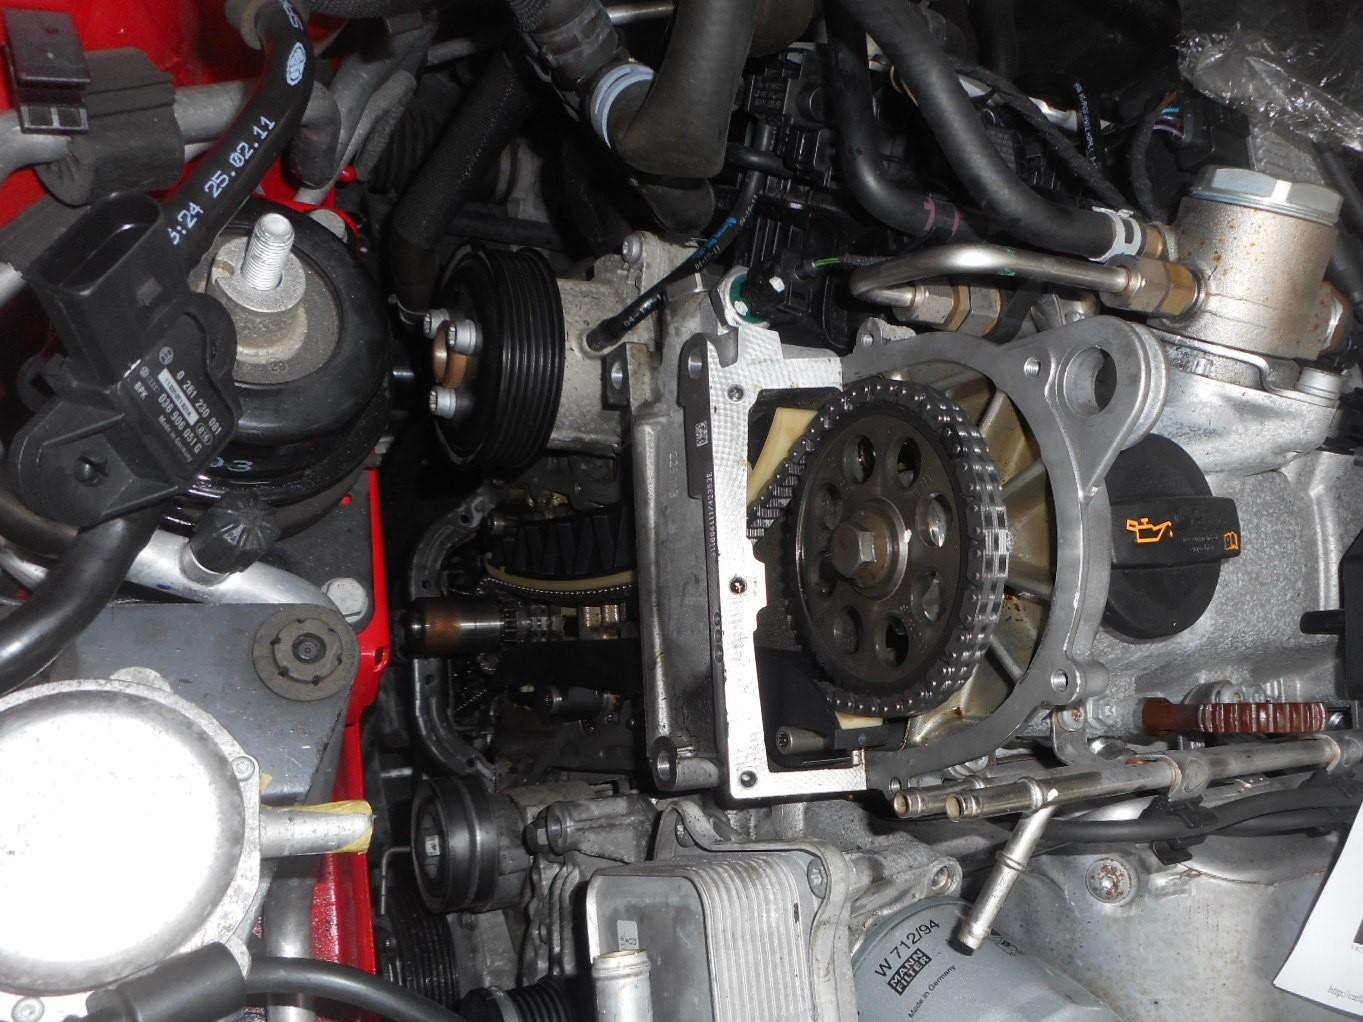 VW ポロ(6R) タイミングチェーン交換_c0267693_16553747.jpg